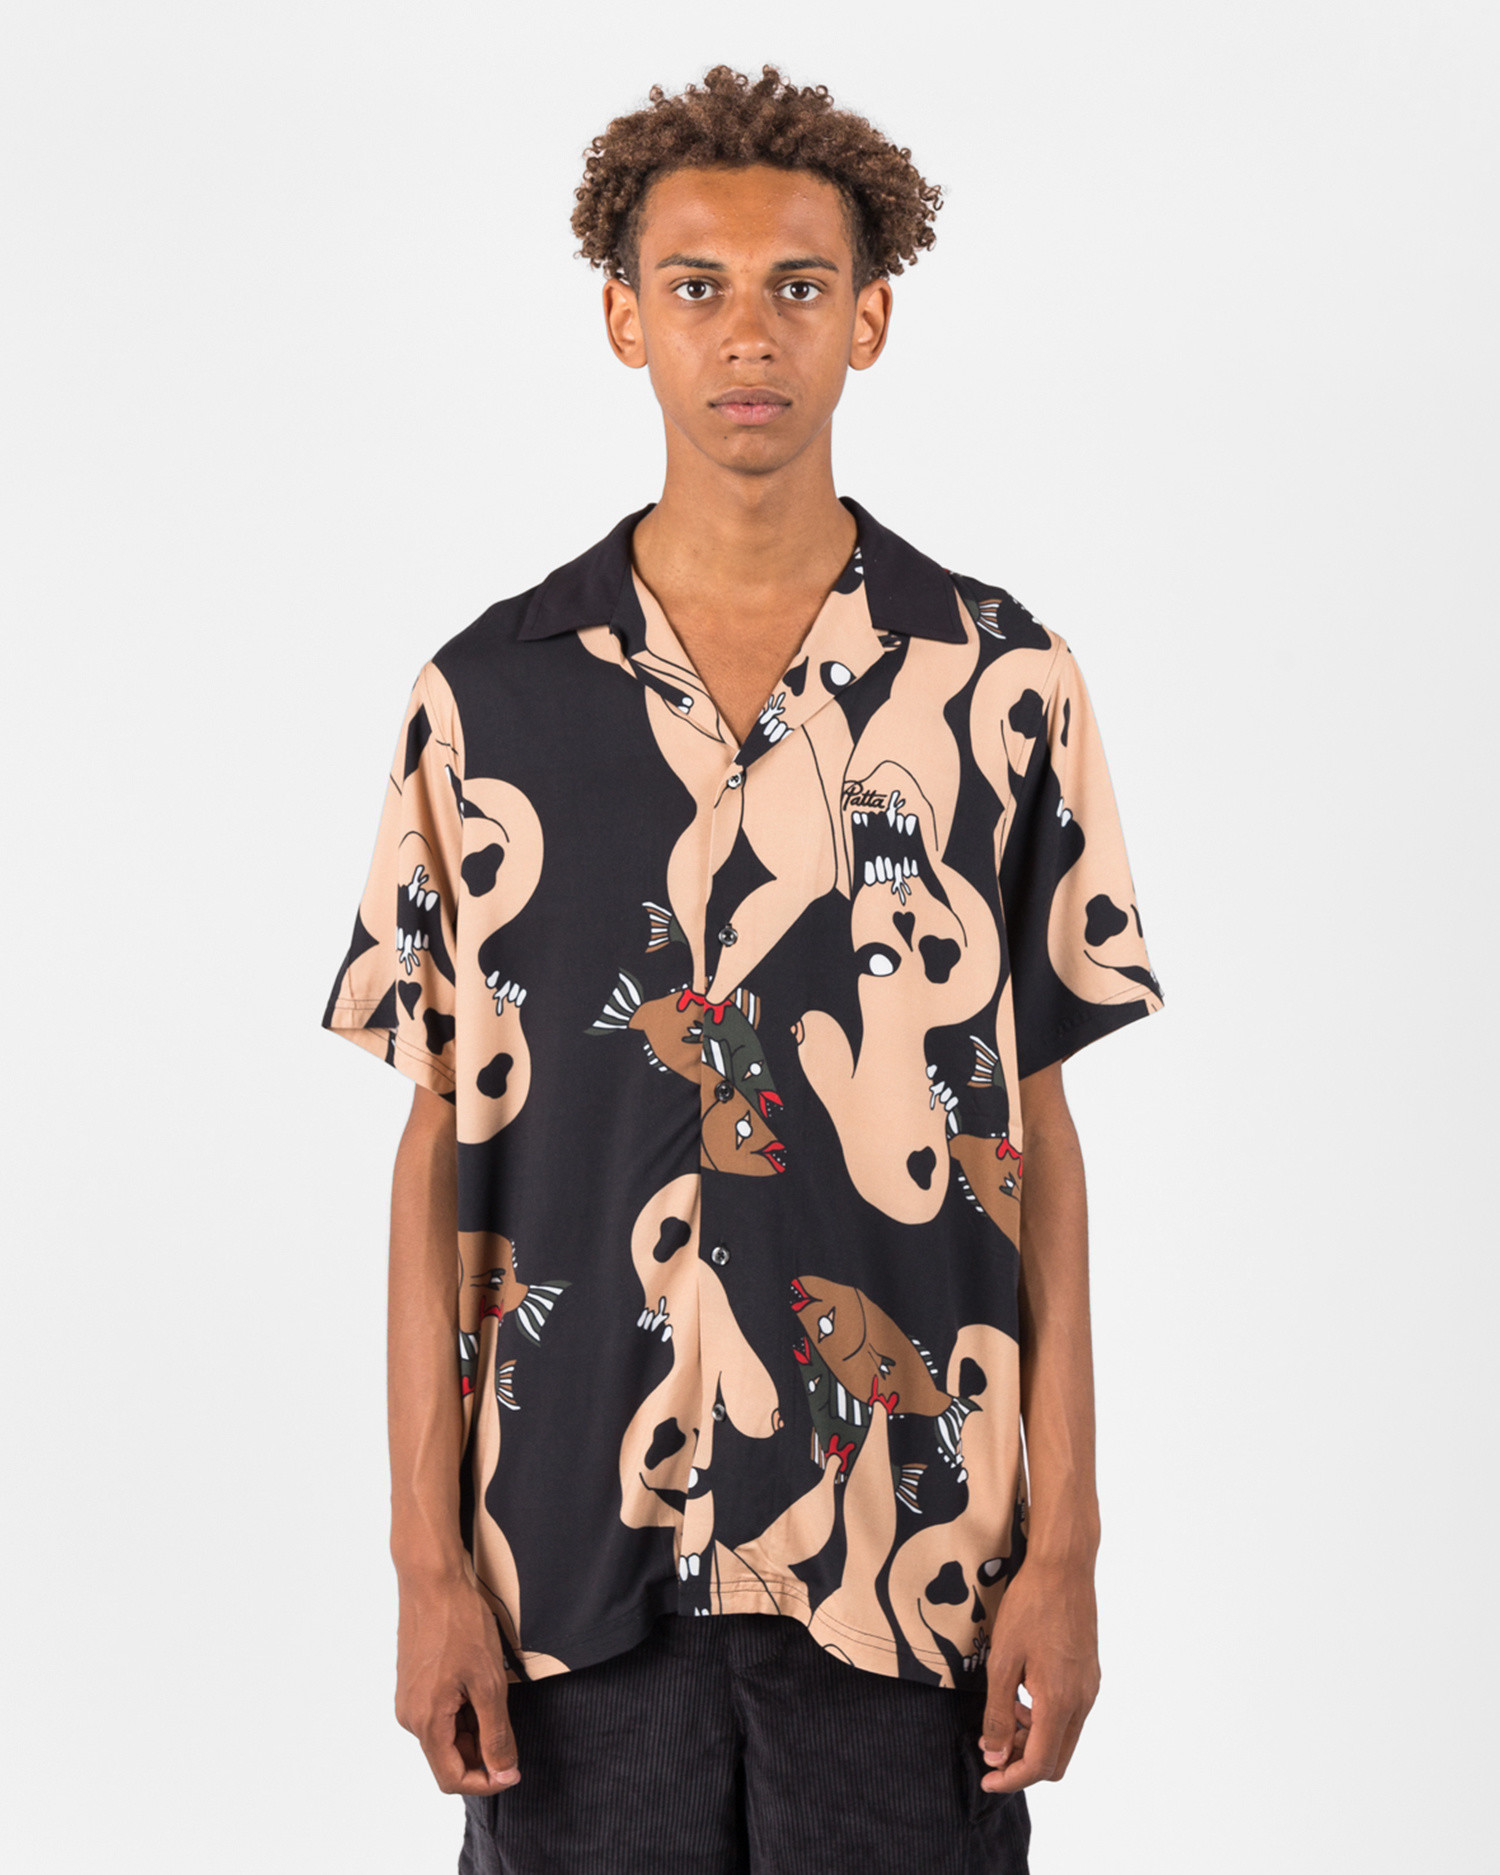 Patta Fish Feet Shortsleeve Rayon Shirt Black/Multi